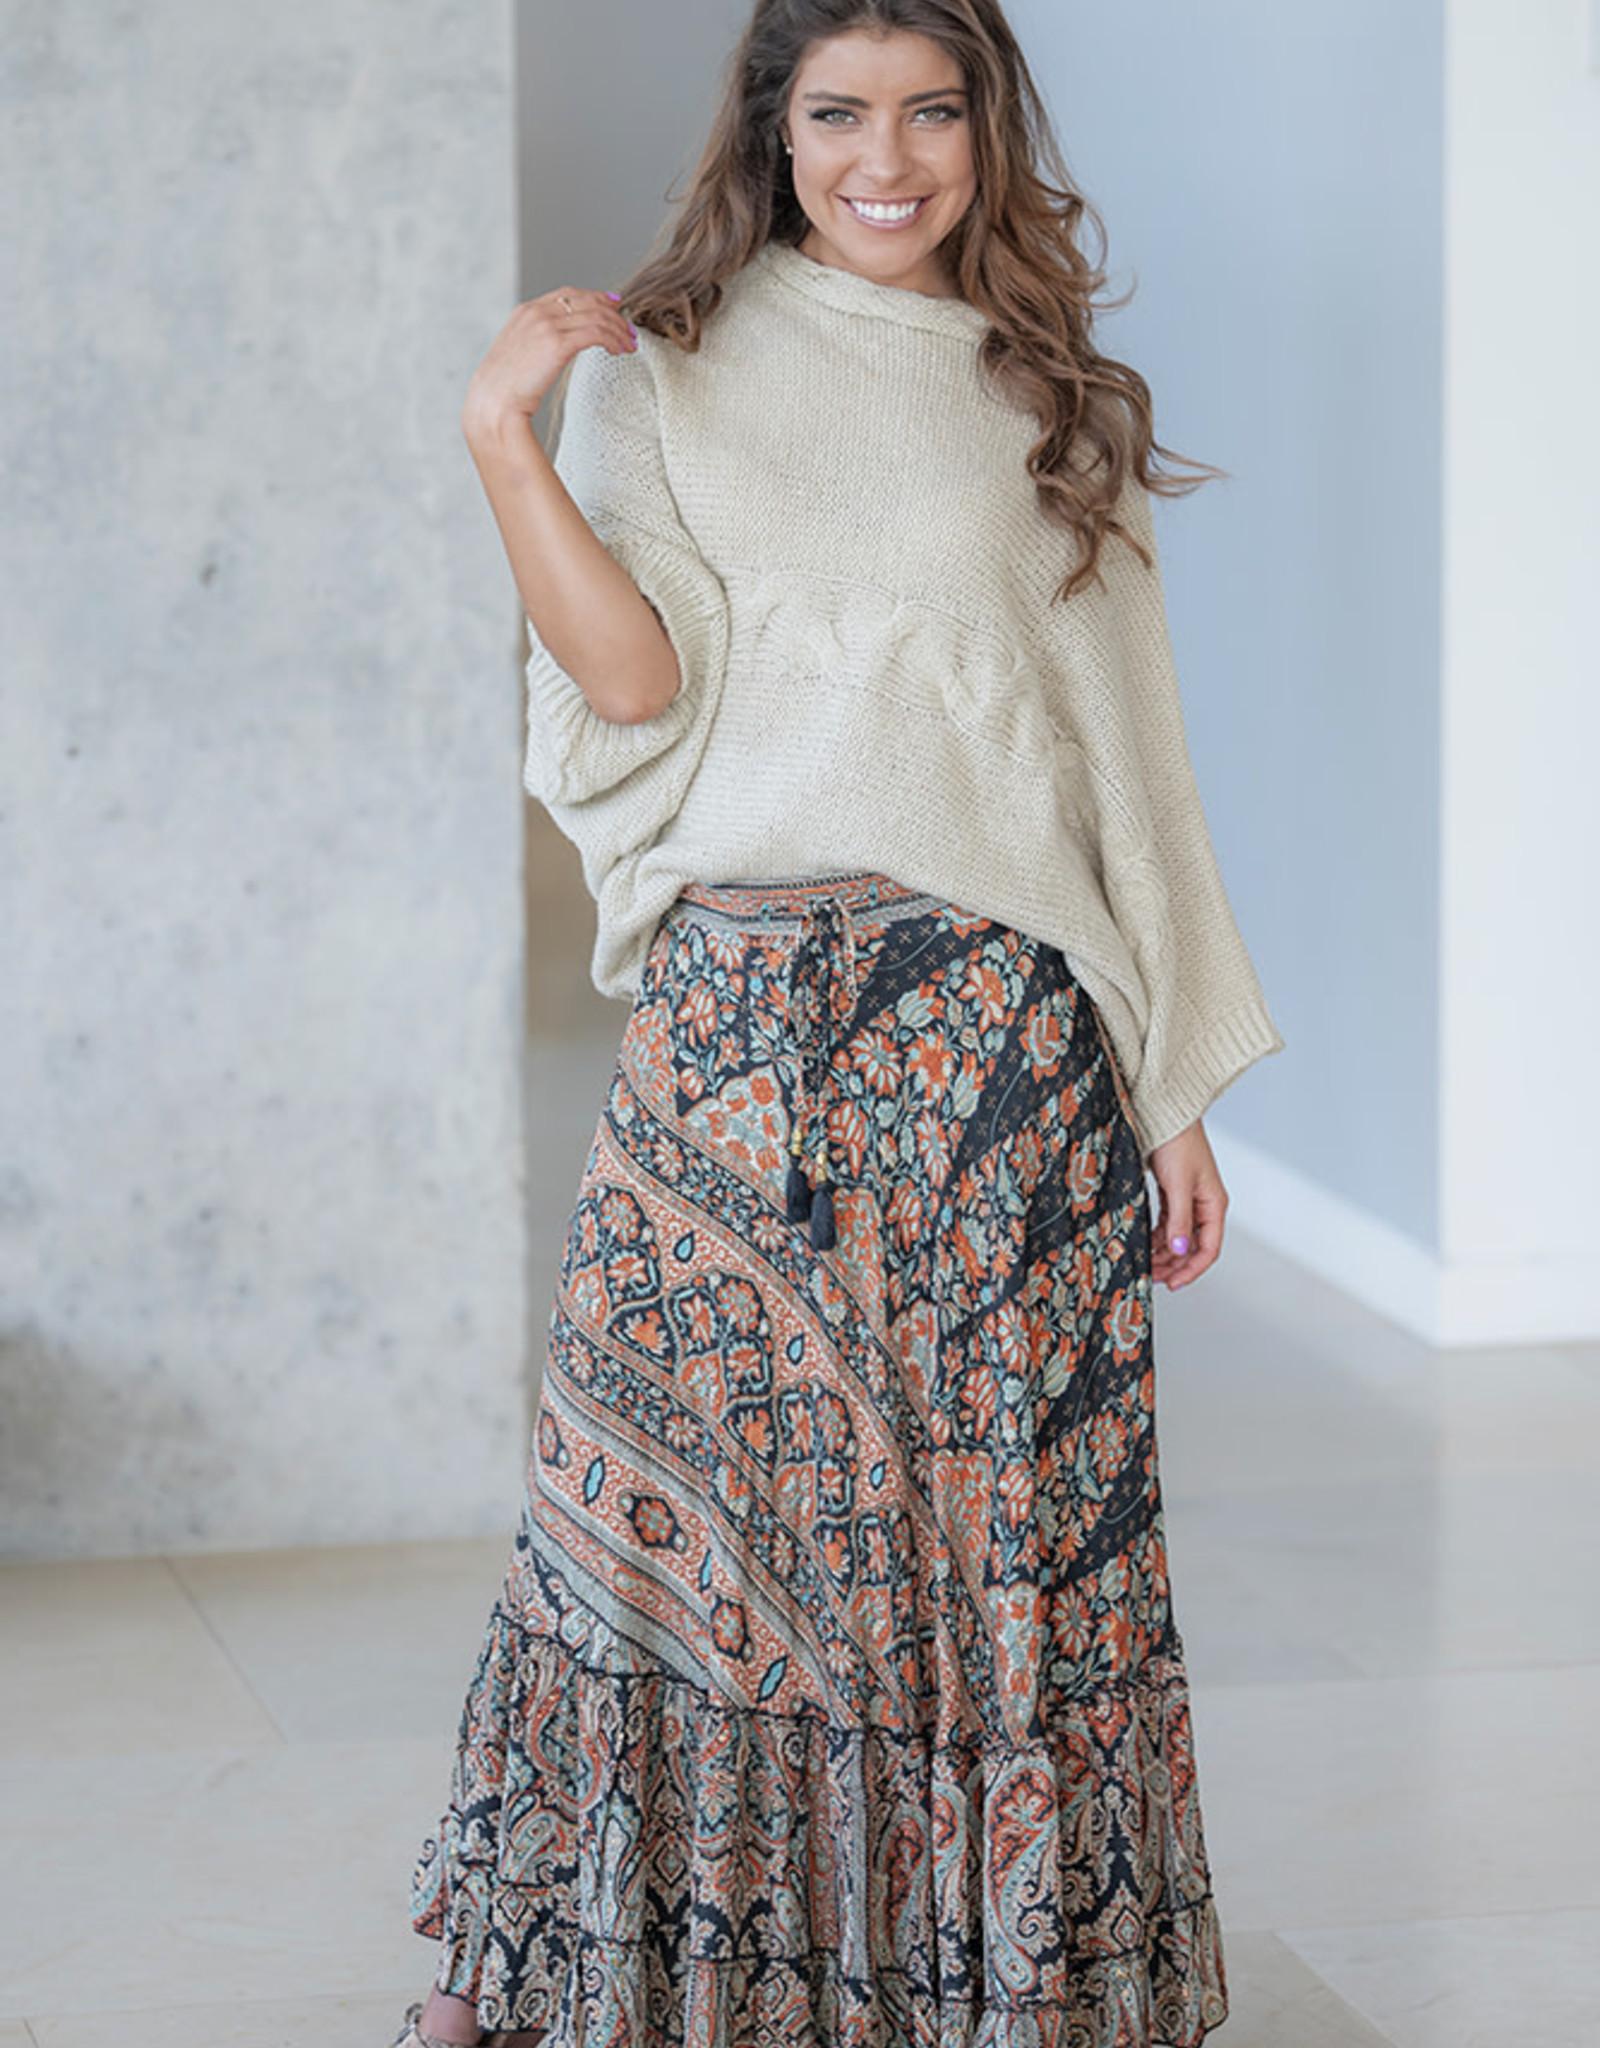 Cienna Chey Skirt